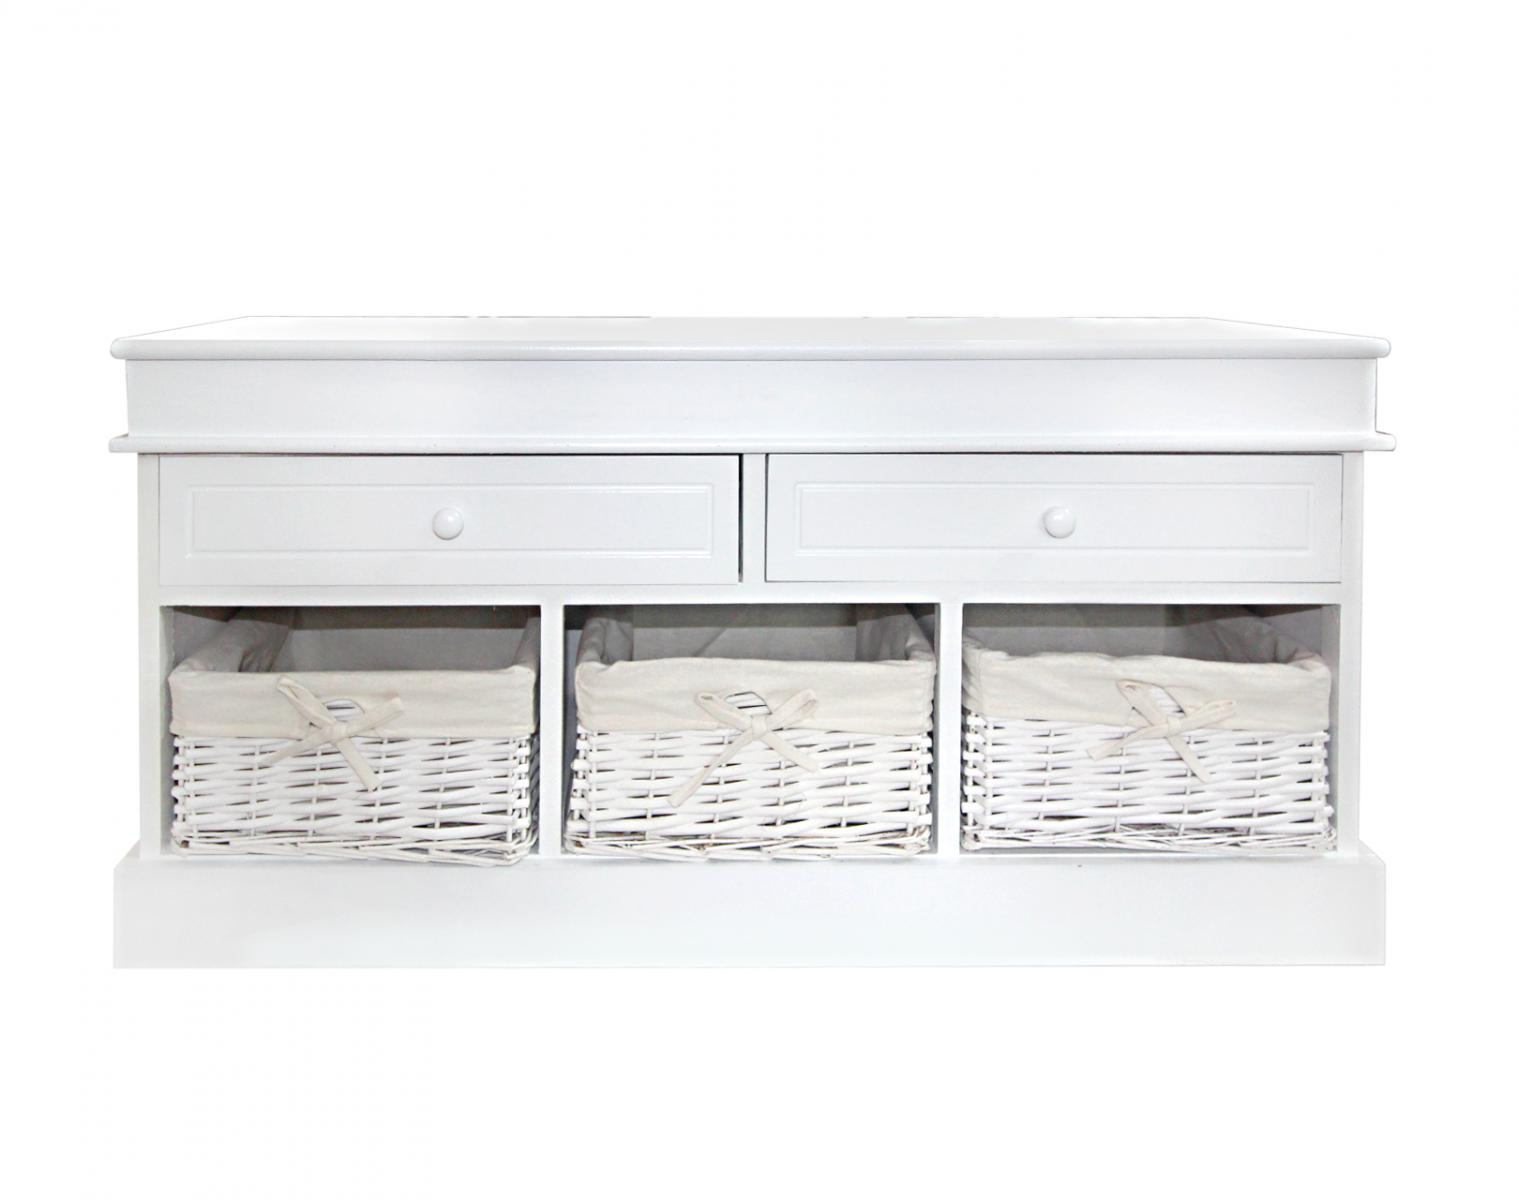 Panca panchina contenitore bianca con 3 cestini in vimini for Panca cucina ikea